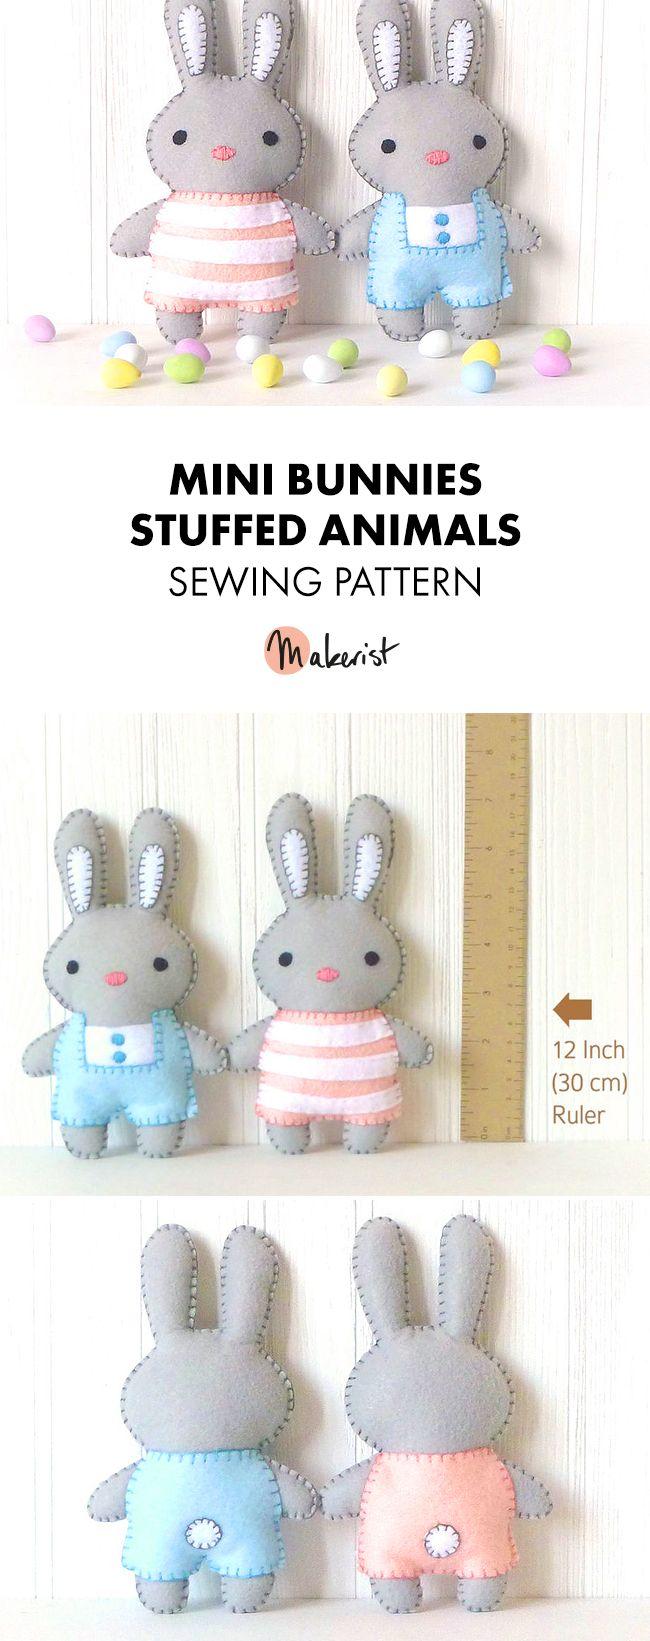 Cute Mini Bunnies- Sewing Pattern via Makerist.com   #stuffedanimal #kidstoys #diy #sewingpattern #sewingwithmakerist